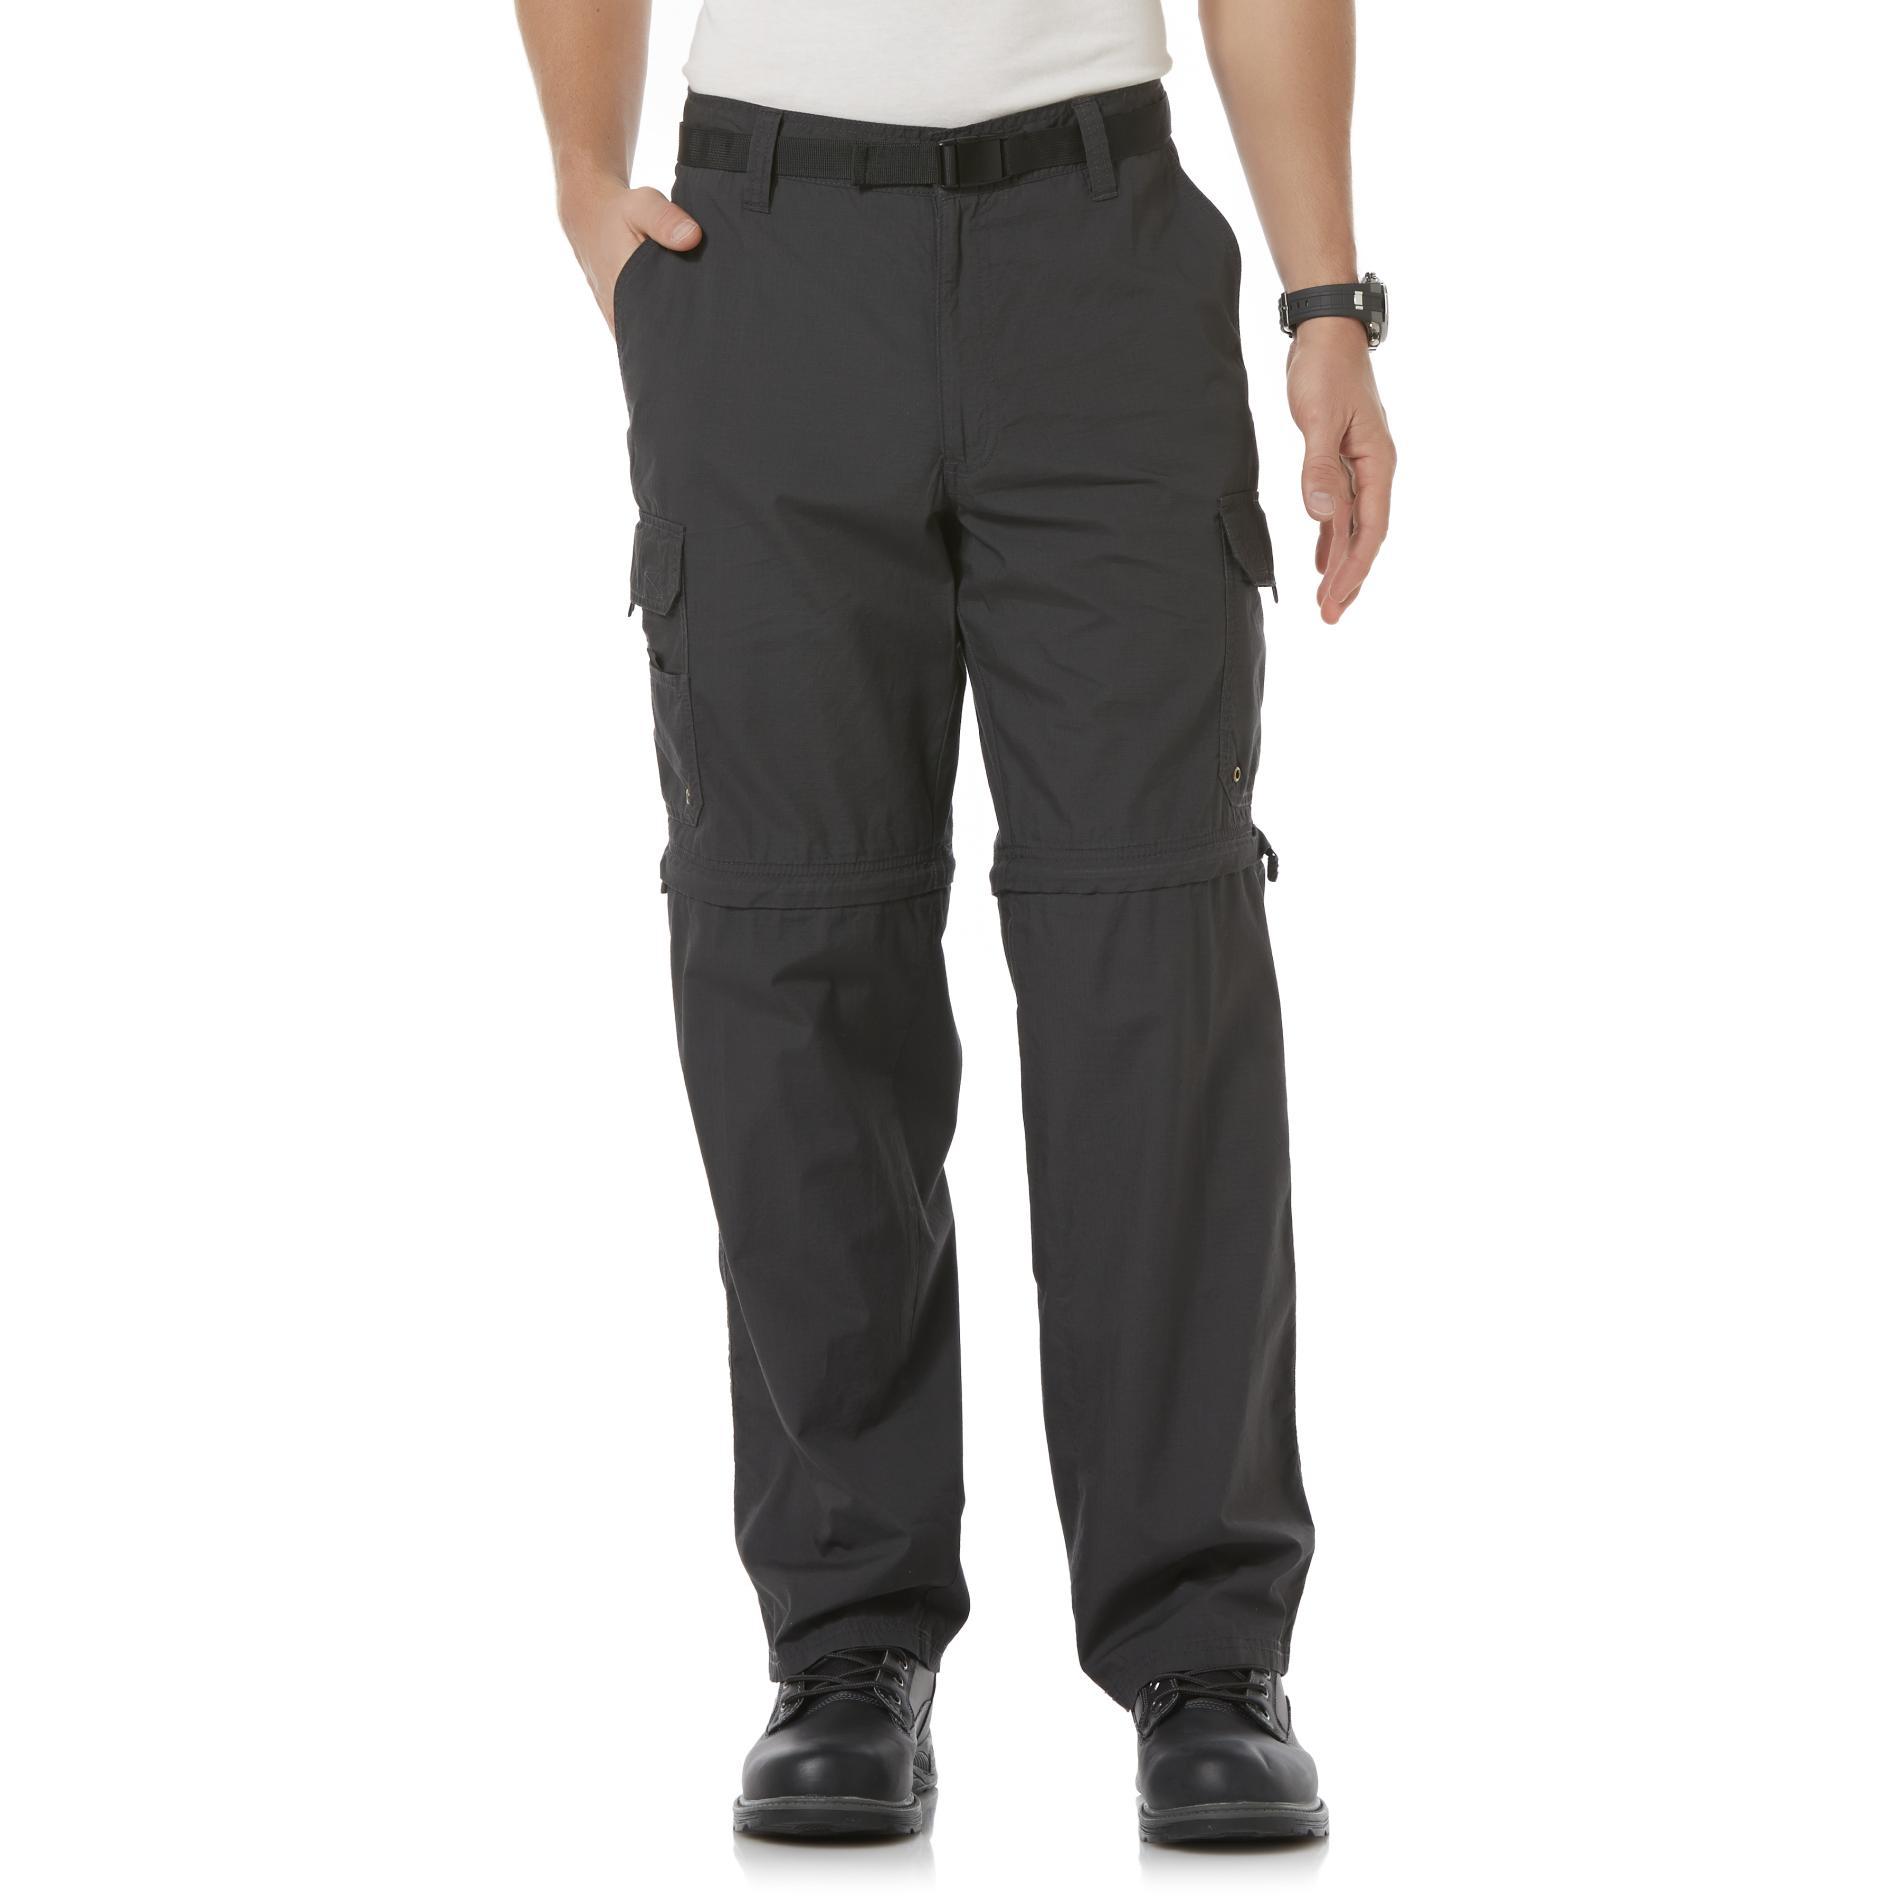 Northwest Territory Mens ZipOff Cargo Pants  Belt